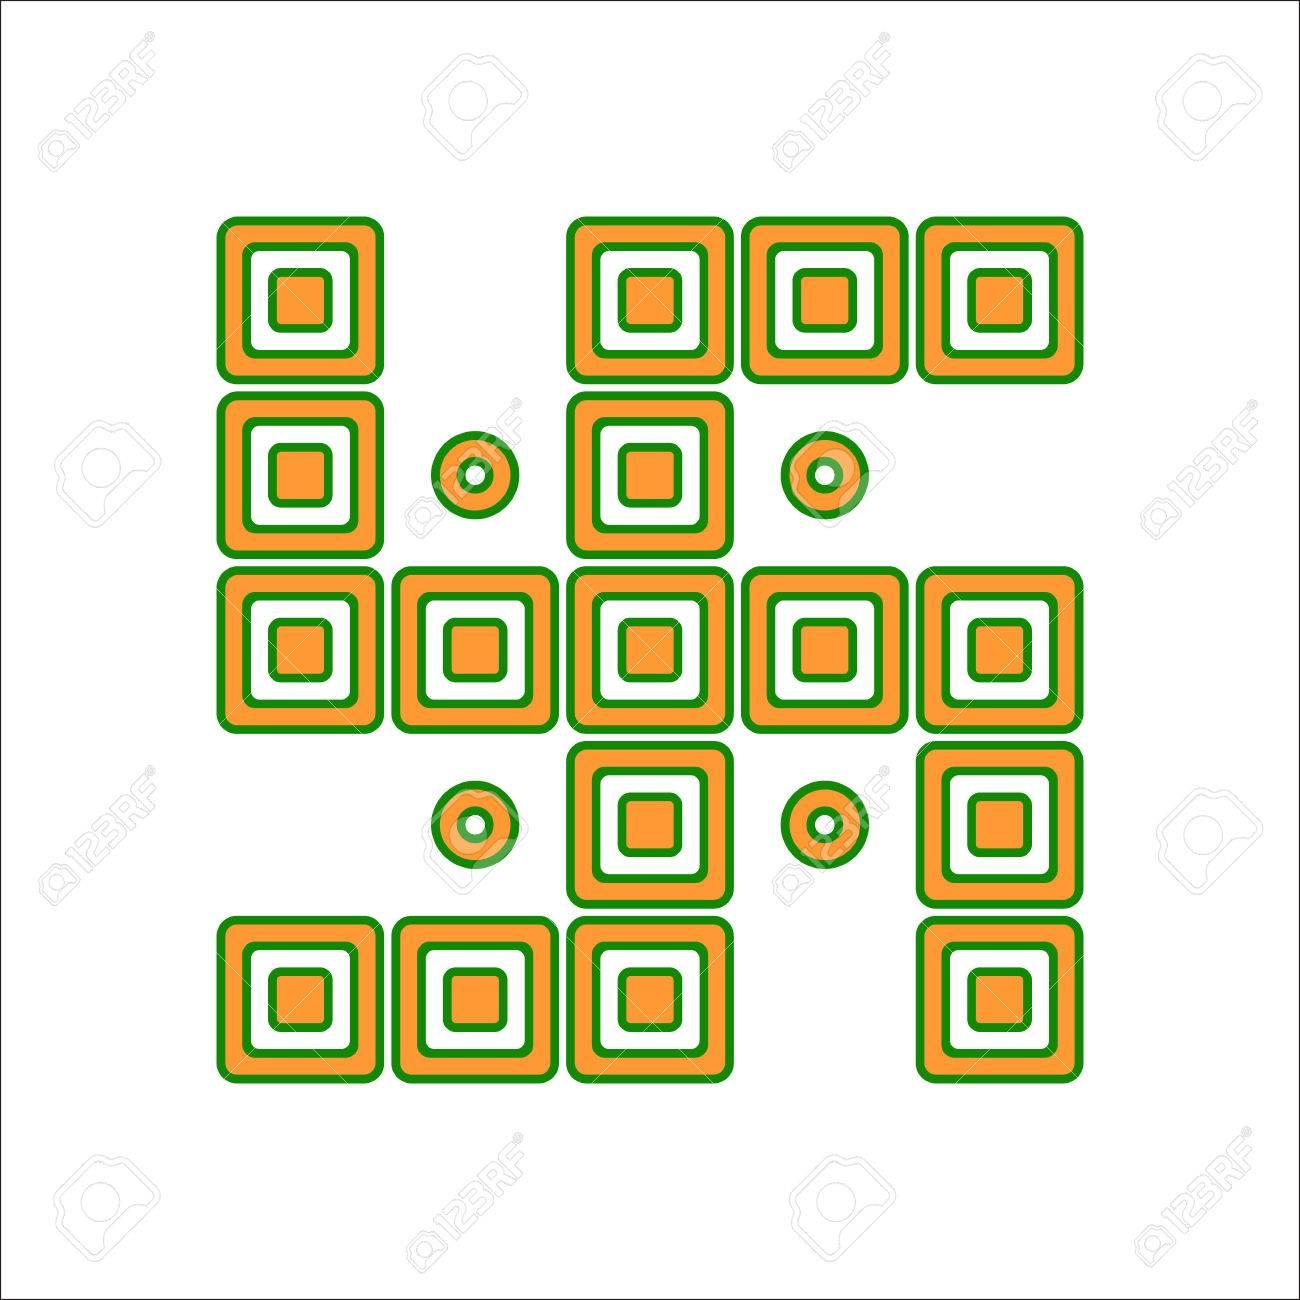 Indan Swastika Symbol Simple Flat Icon On Background Royalty Free